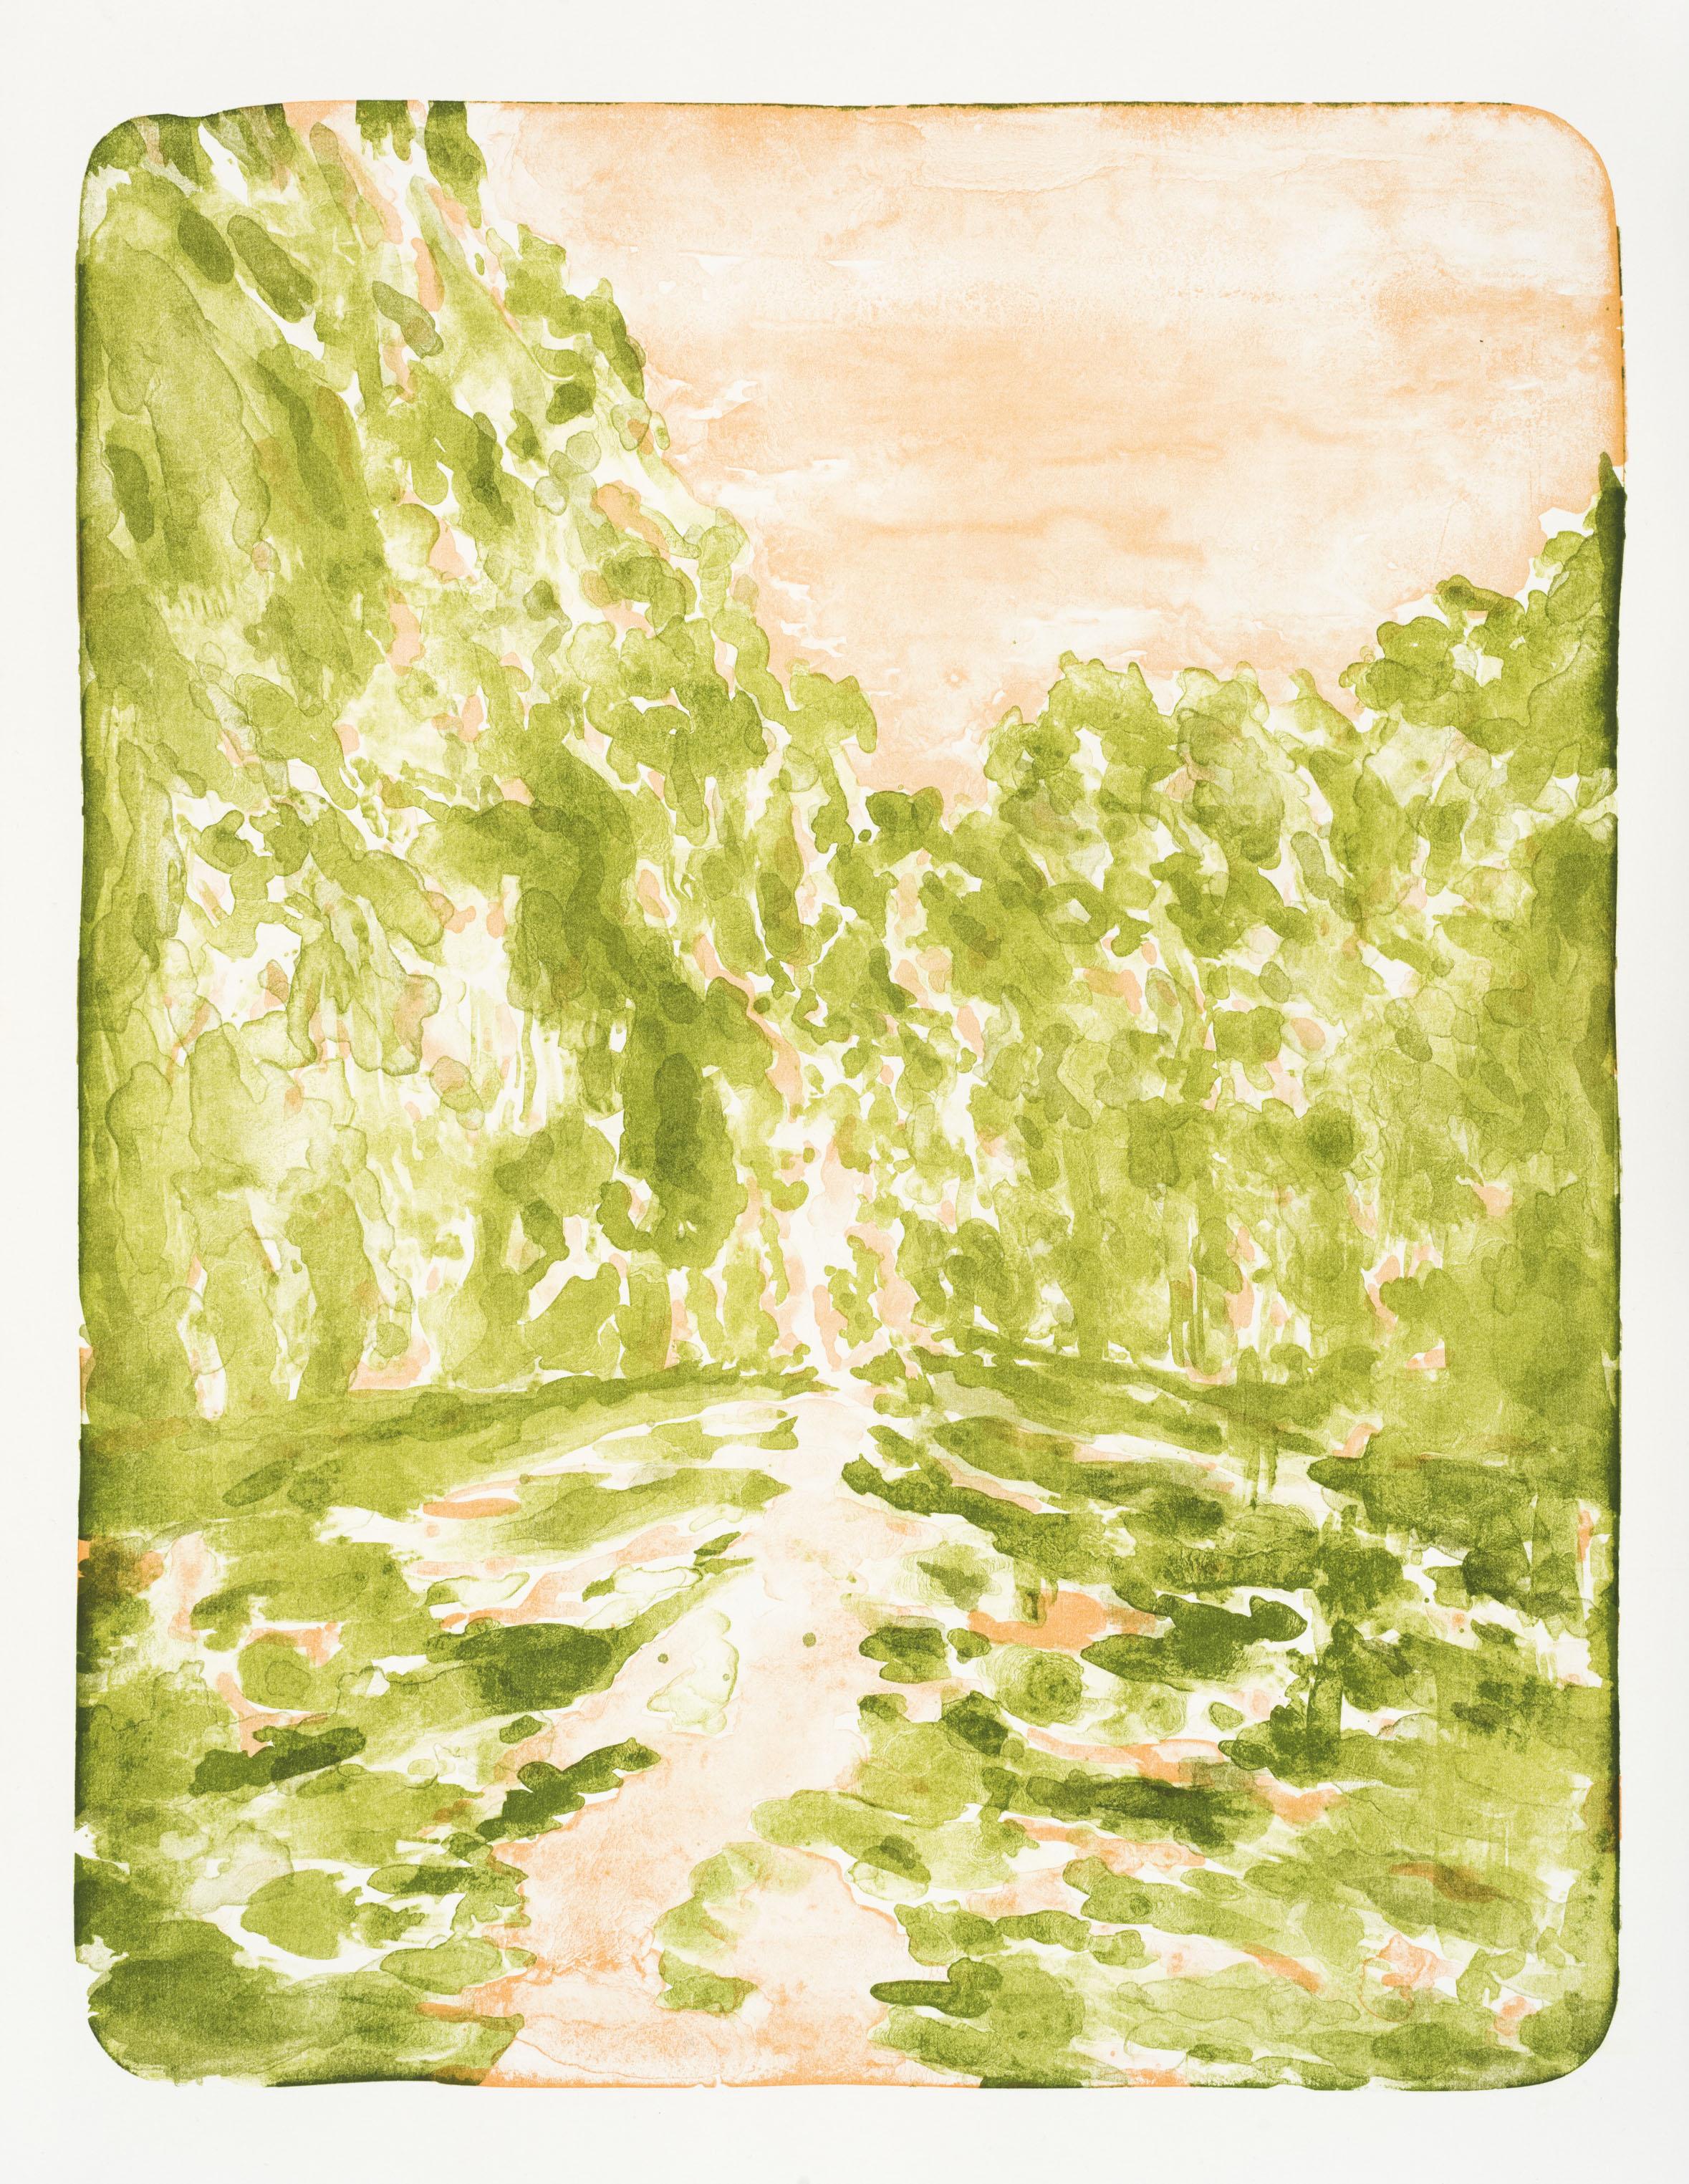 """Fruhling"", 59,5 x 41,7 cm., litho (2014 printed in Berlin)"